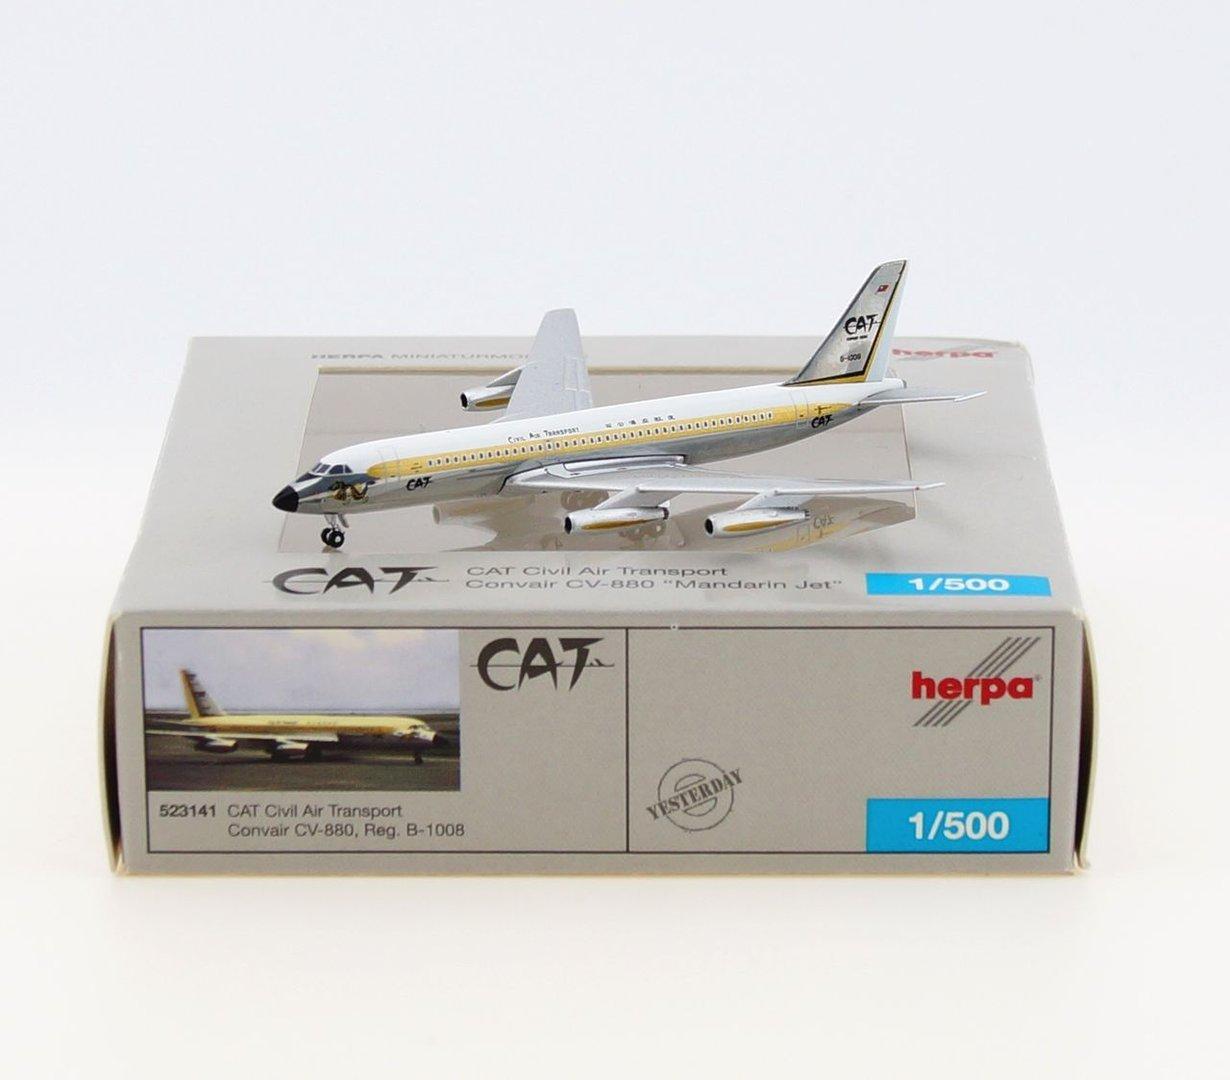 CAT Civil Air Transport Convair CV-880